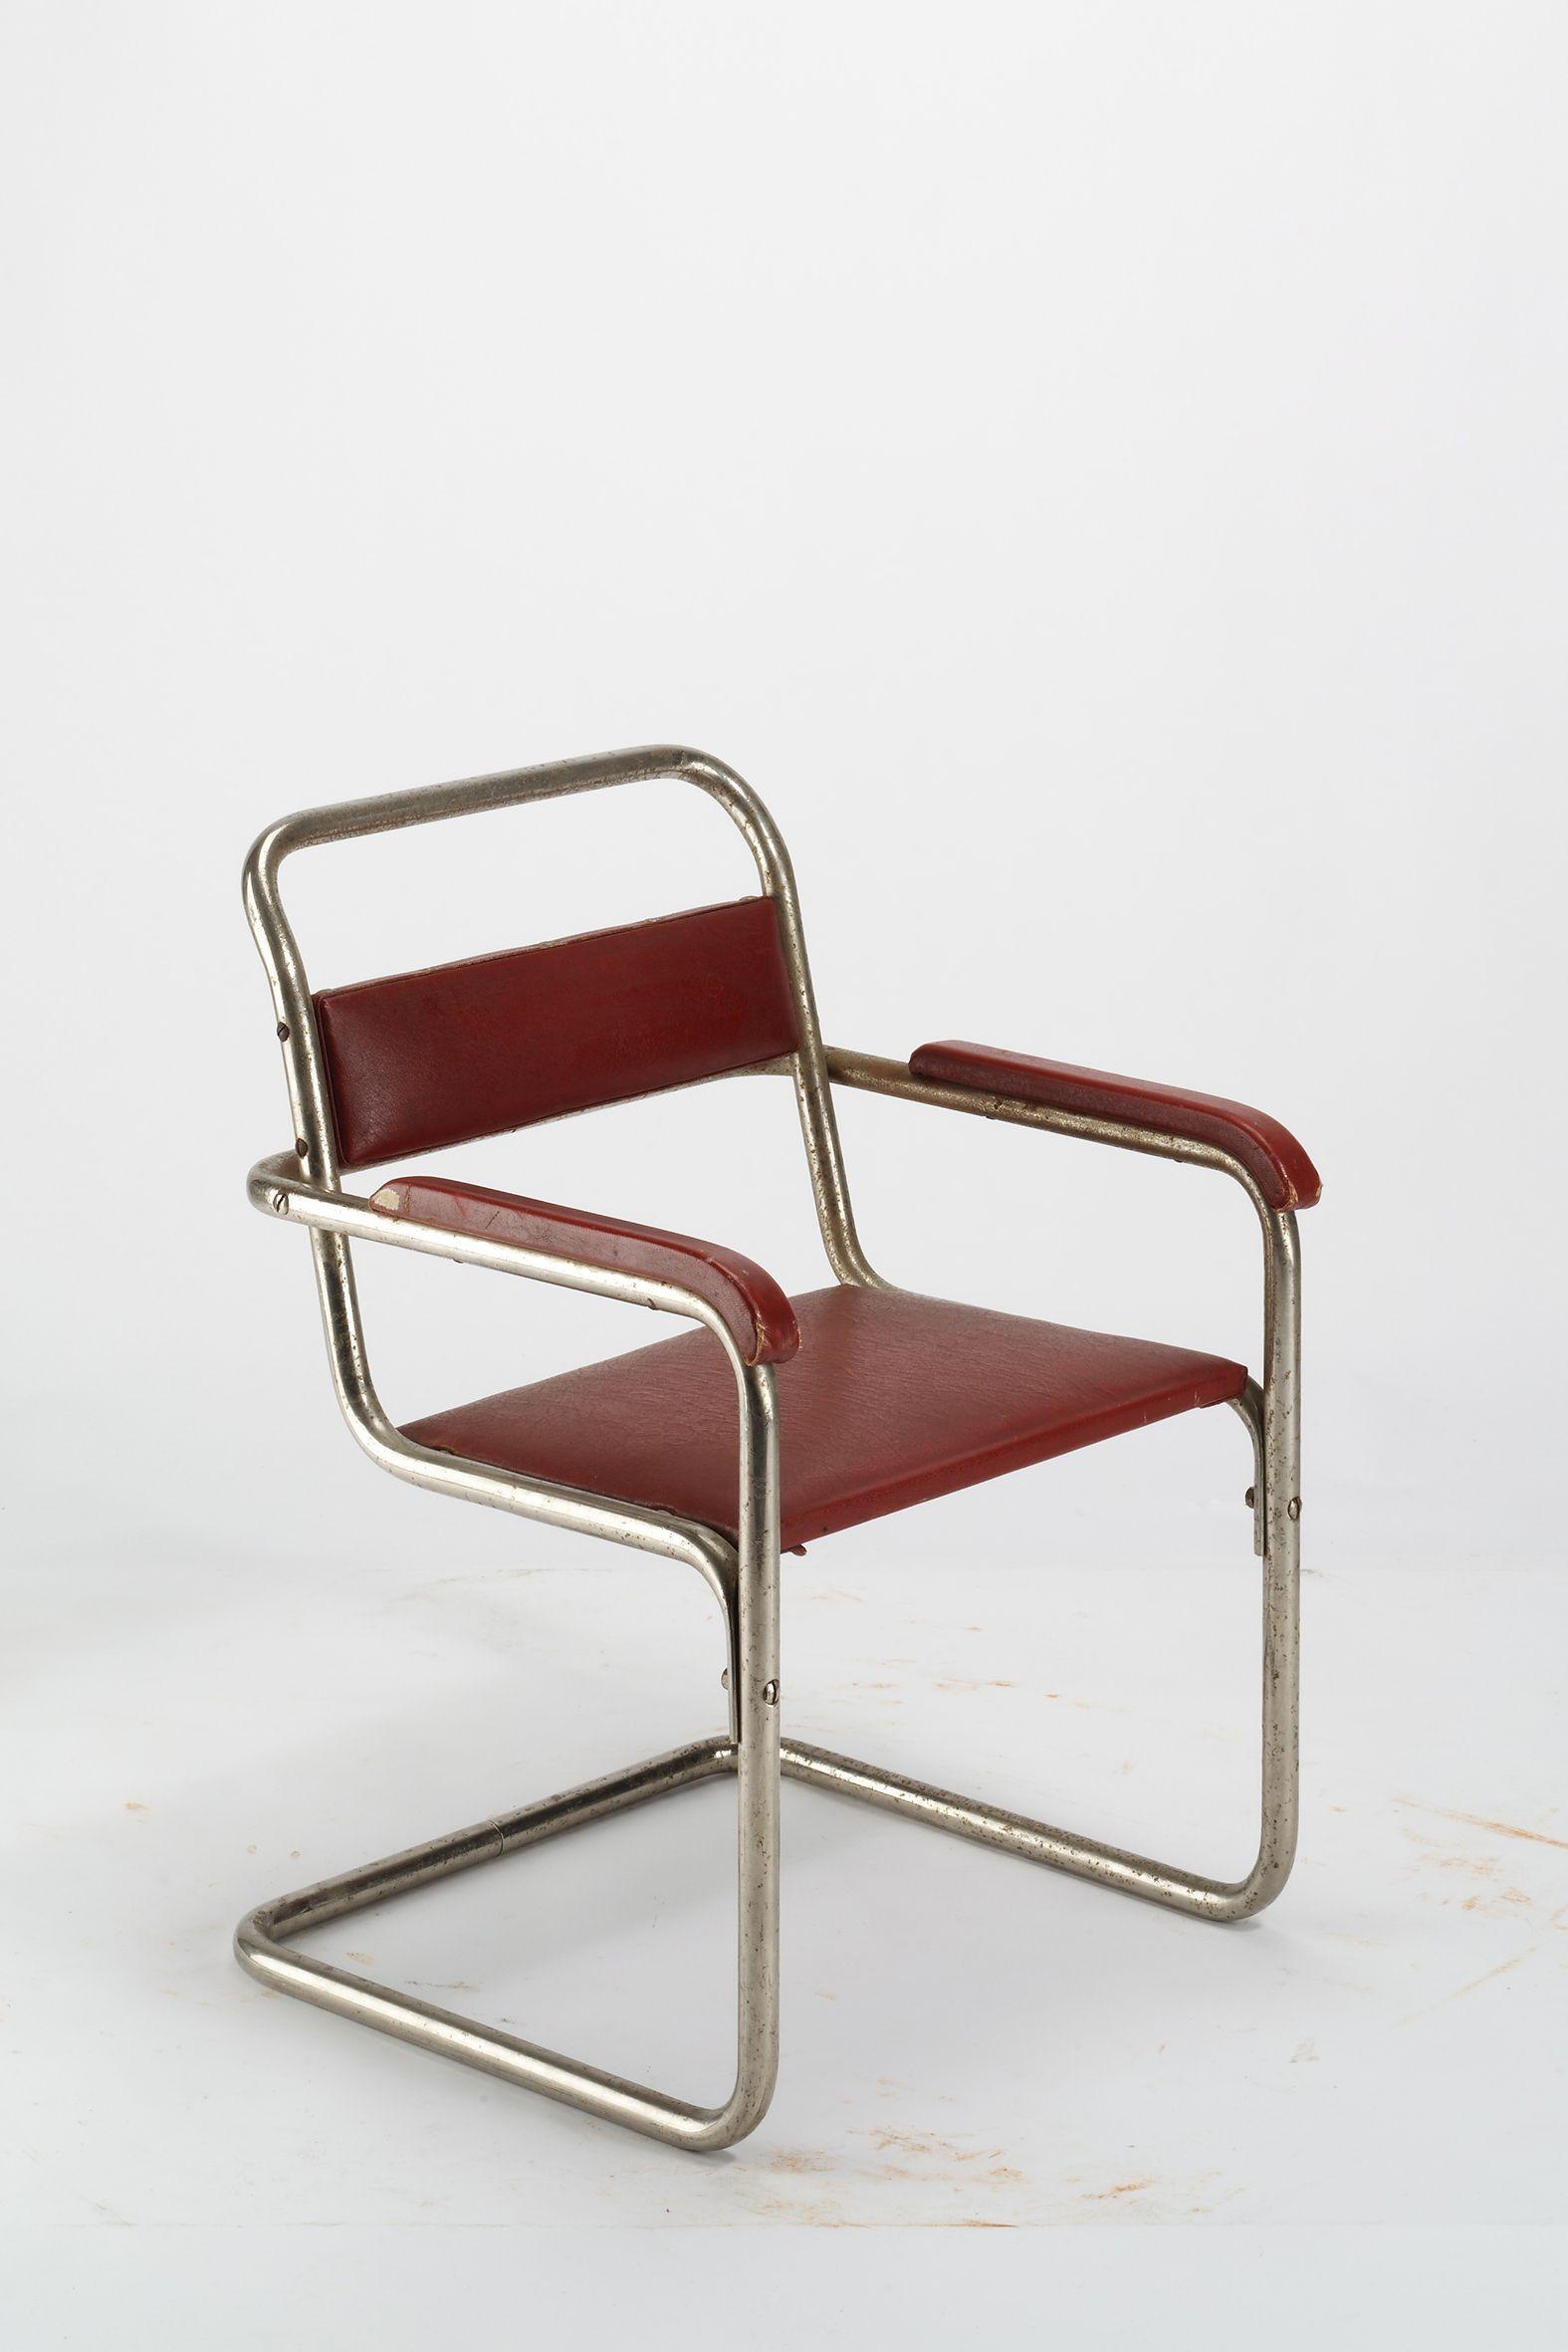 Marcel Breuer Sessel marcel breuer kinderarmlehnstuhl b34 1 2 1929 seating